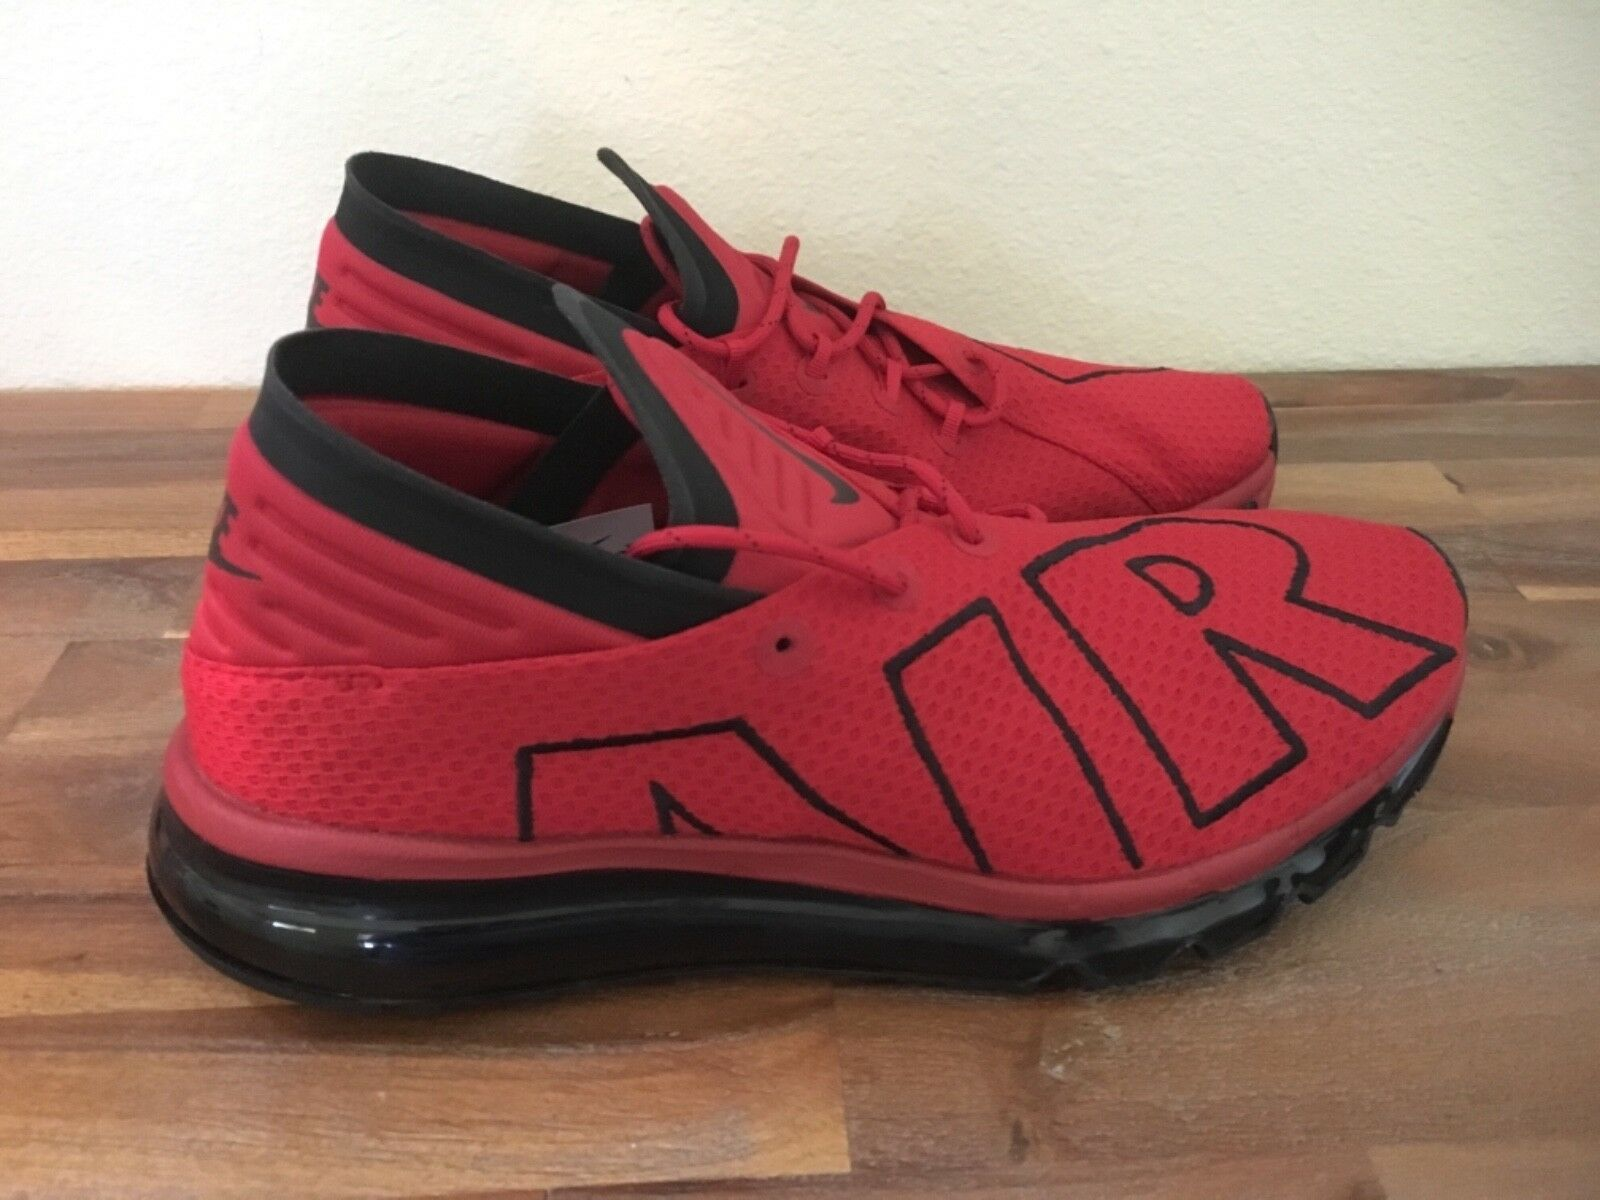 Nike AIR MAX FLAIR Men's Running shoes Red Black 942236-600 Men Sz 9.5